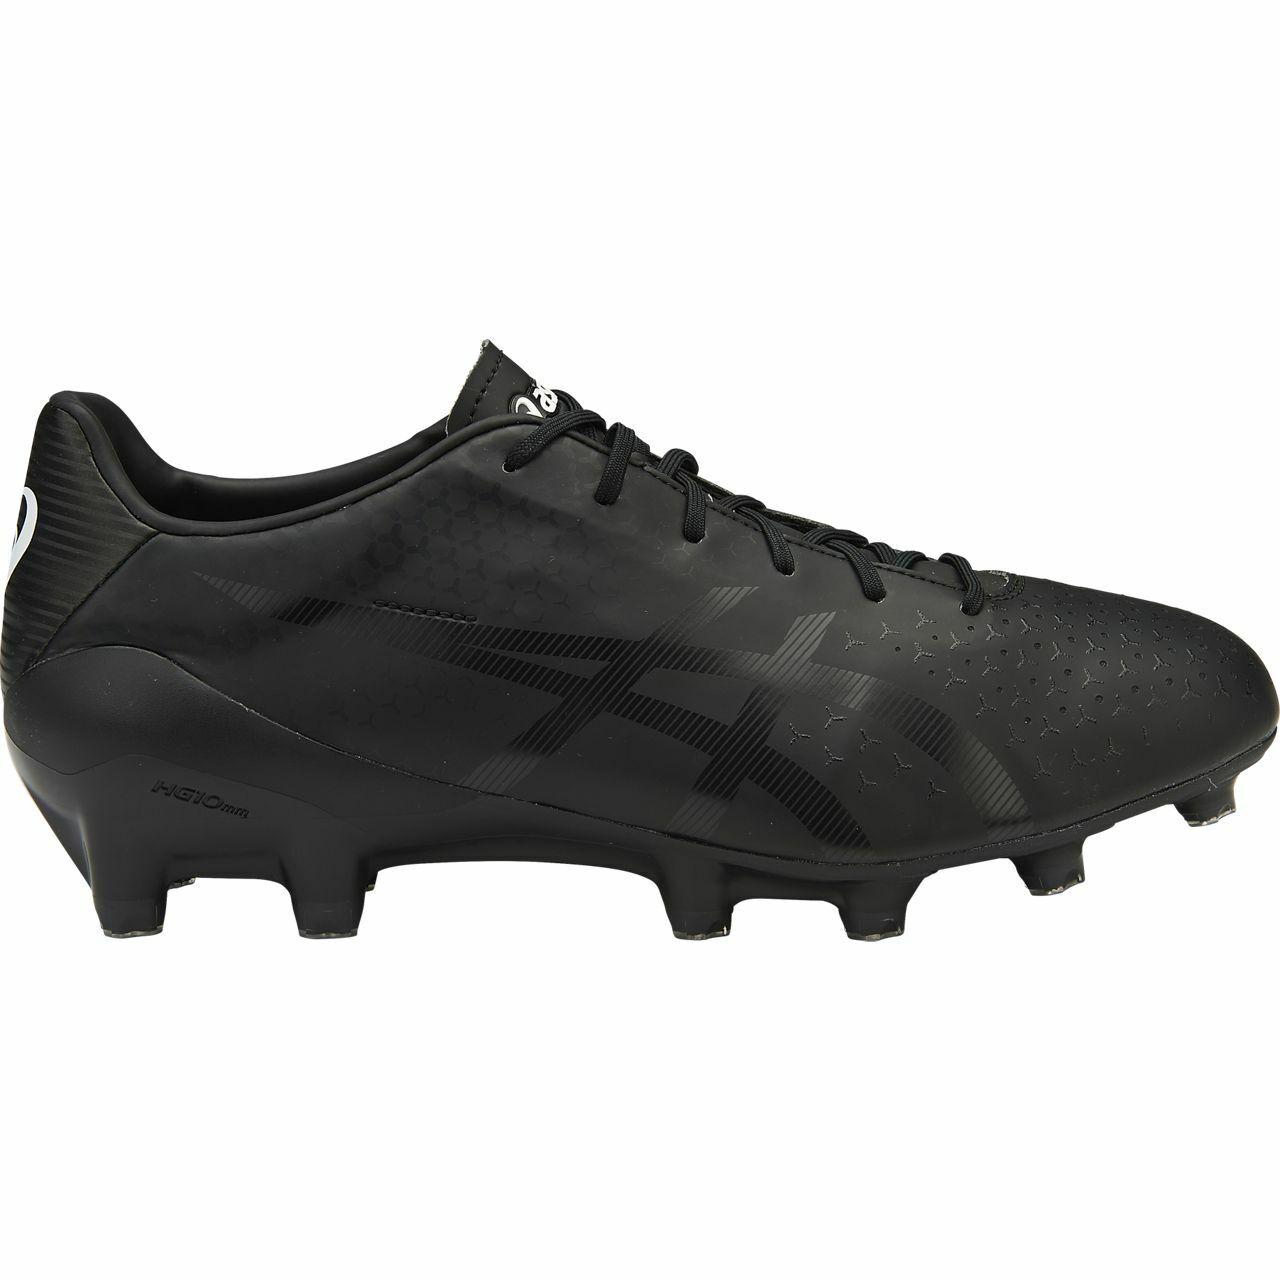 BARGAIN    Asics Menace 3 Mens Football Boots (9099)